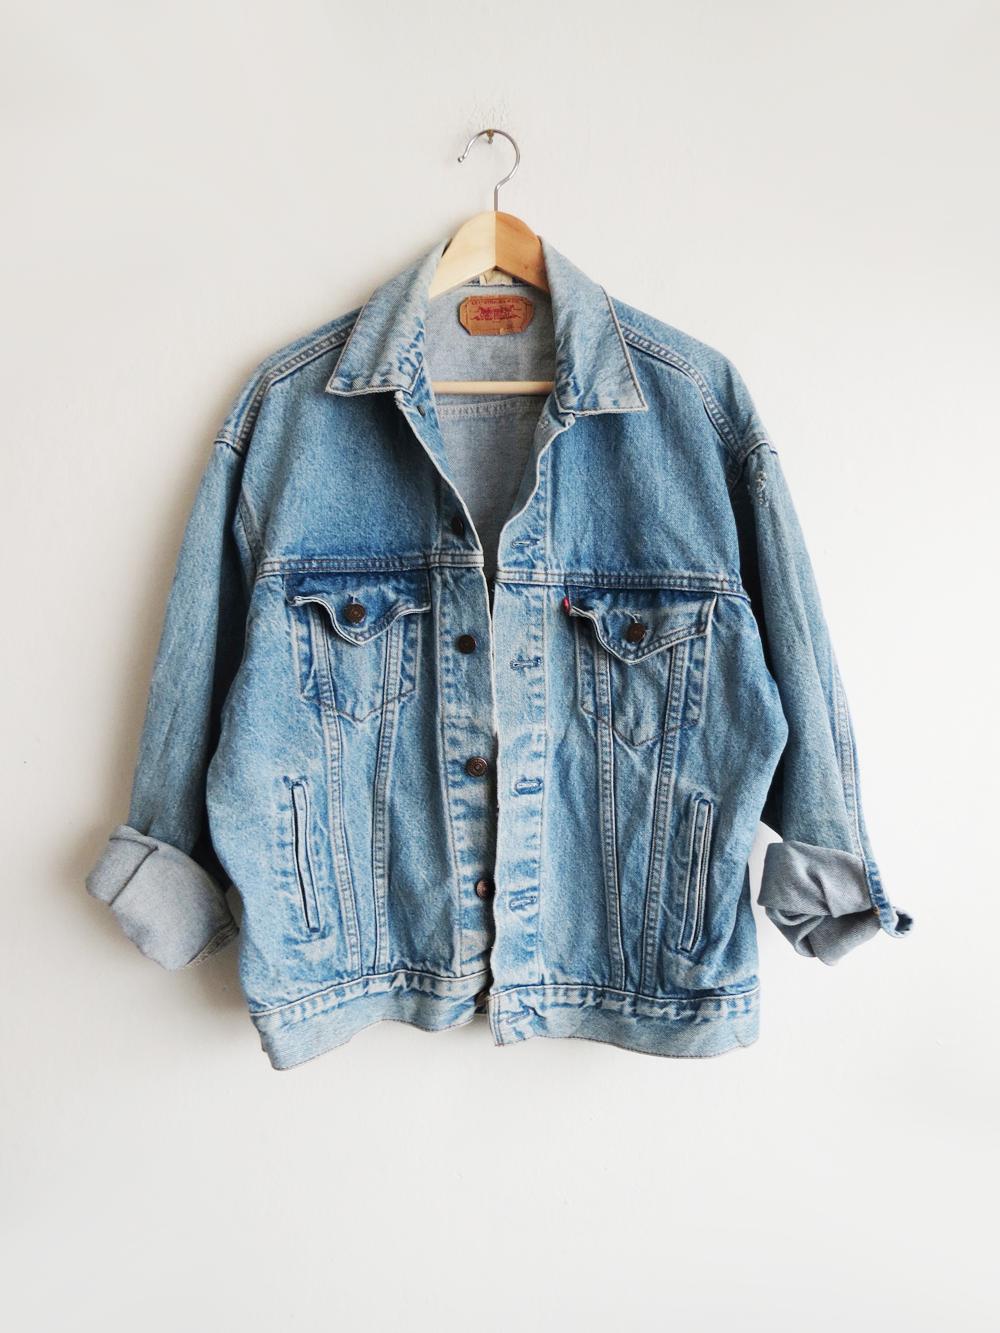 Light Wash Levis Jacket Vintage Levis Jacket Sold Jacket Outfits Clothes Jean Jacket Outfits